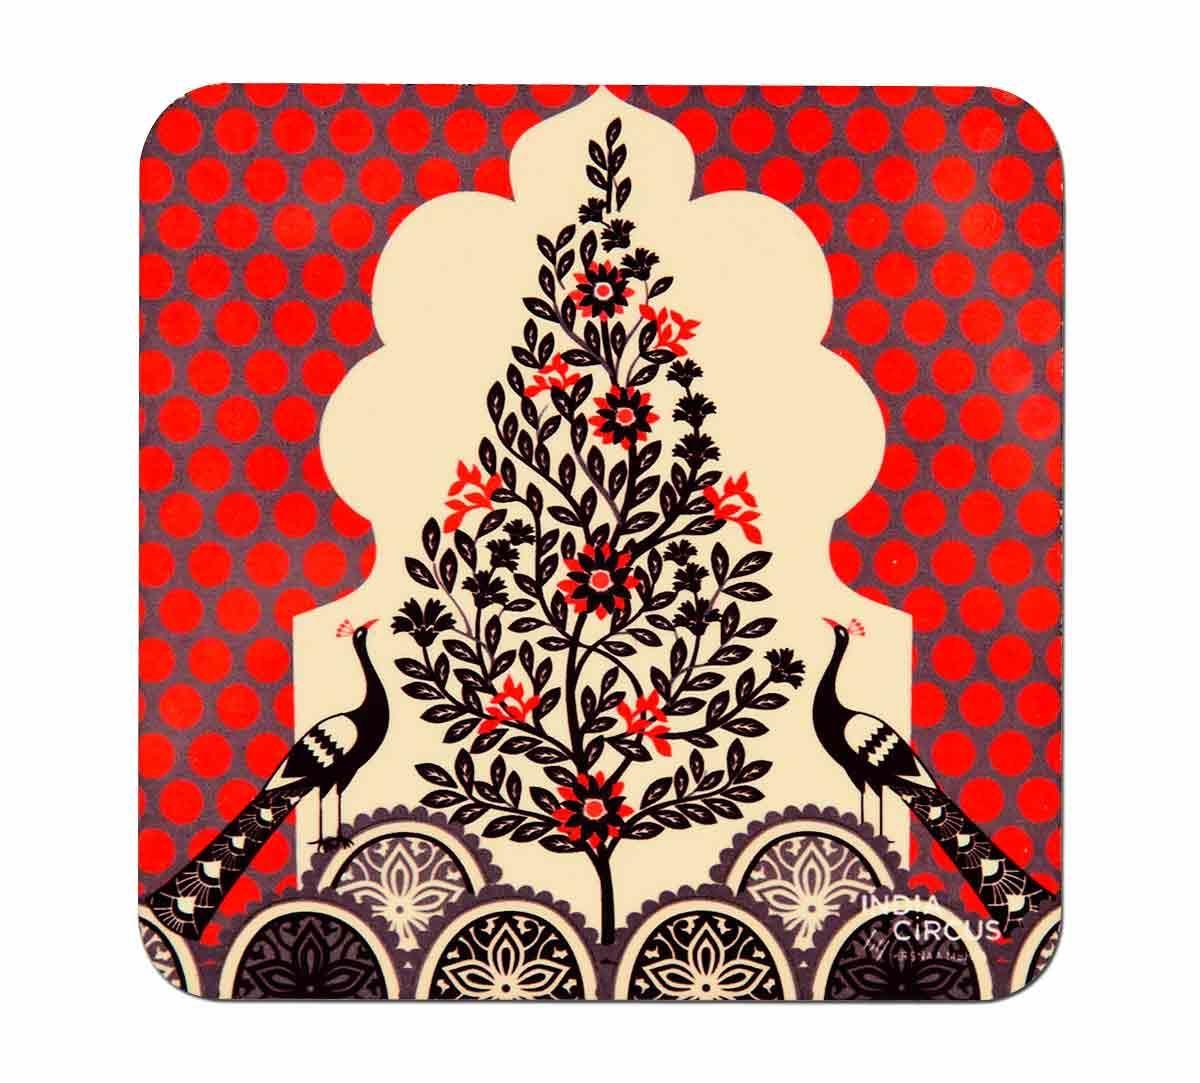 Tree of Dreams MDF Coasters (Set of 6)